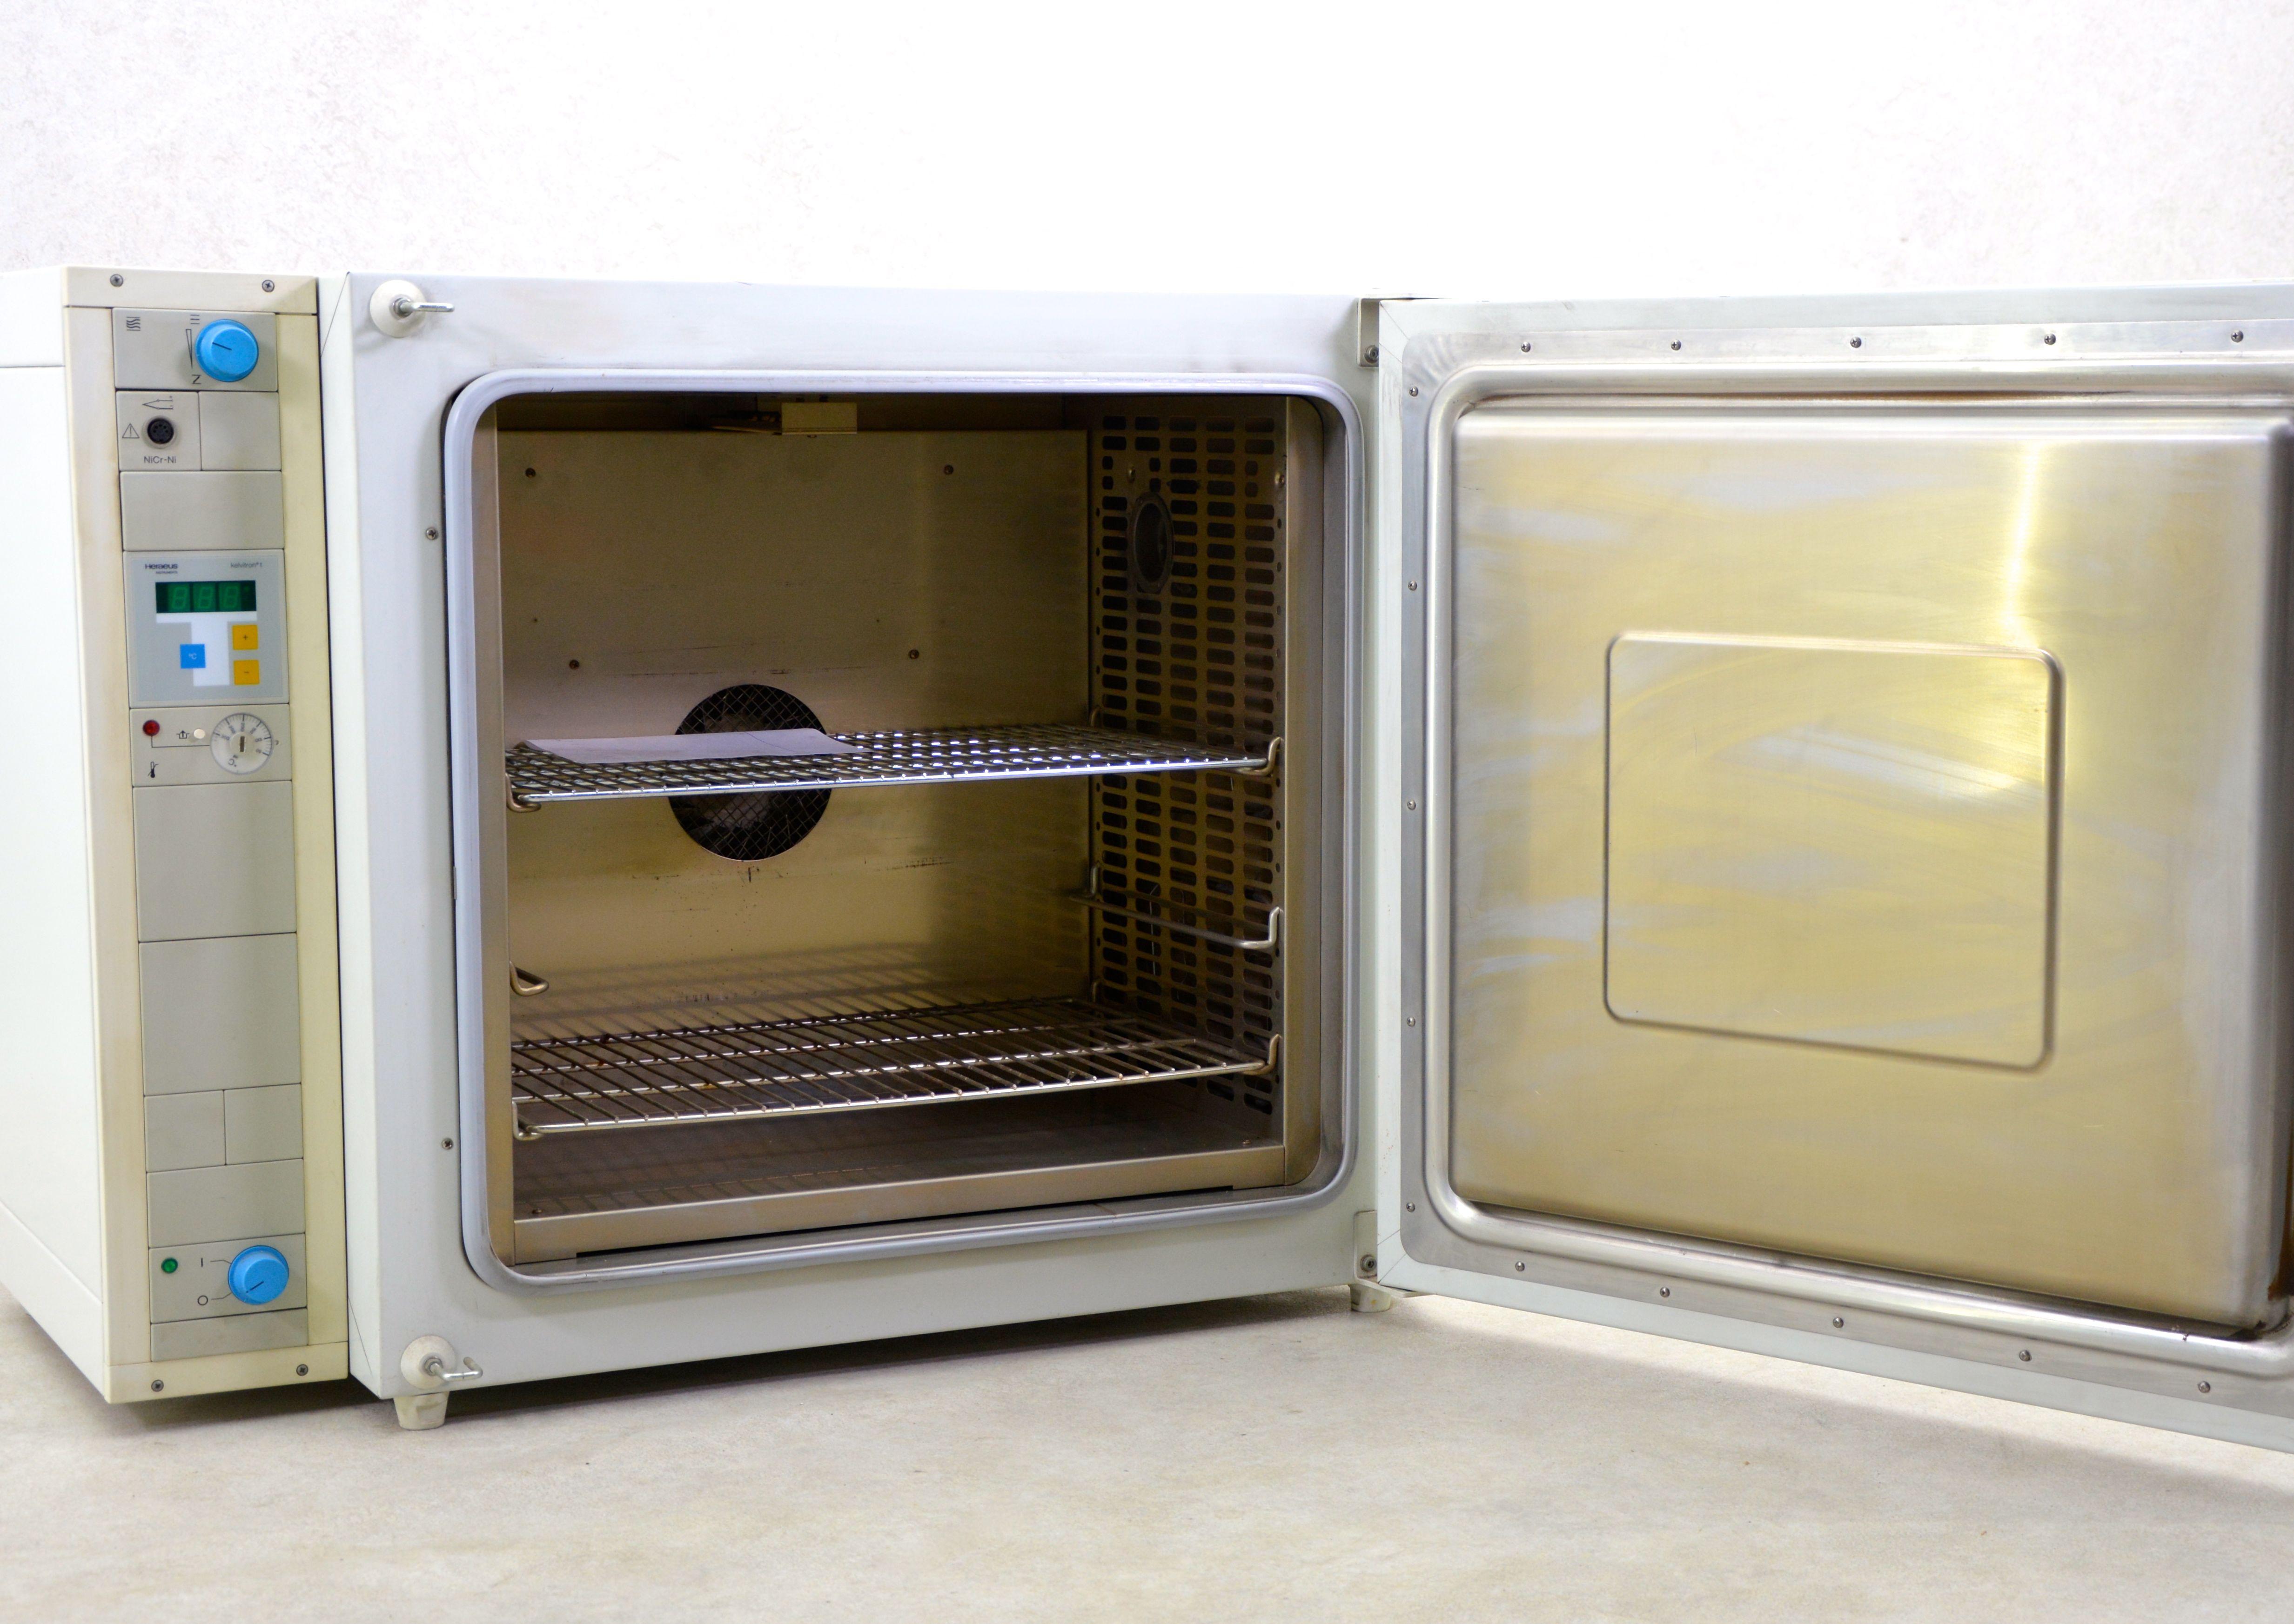 Heraeus UT6120 Oven - Gemini BV